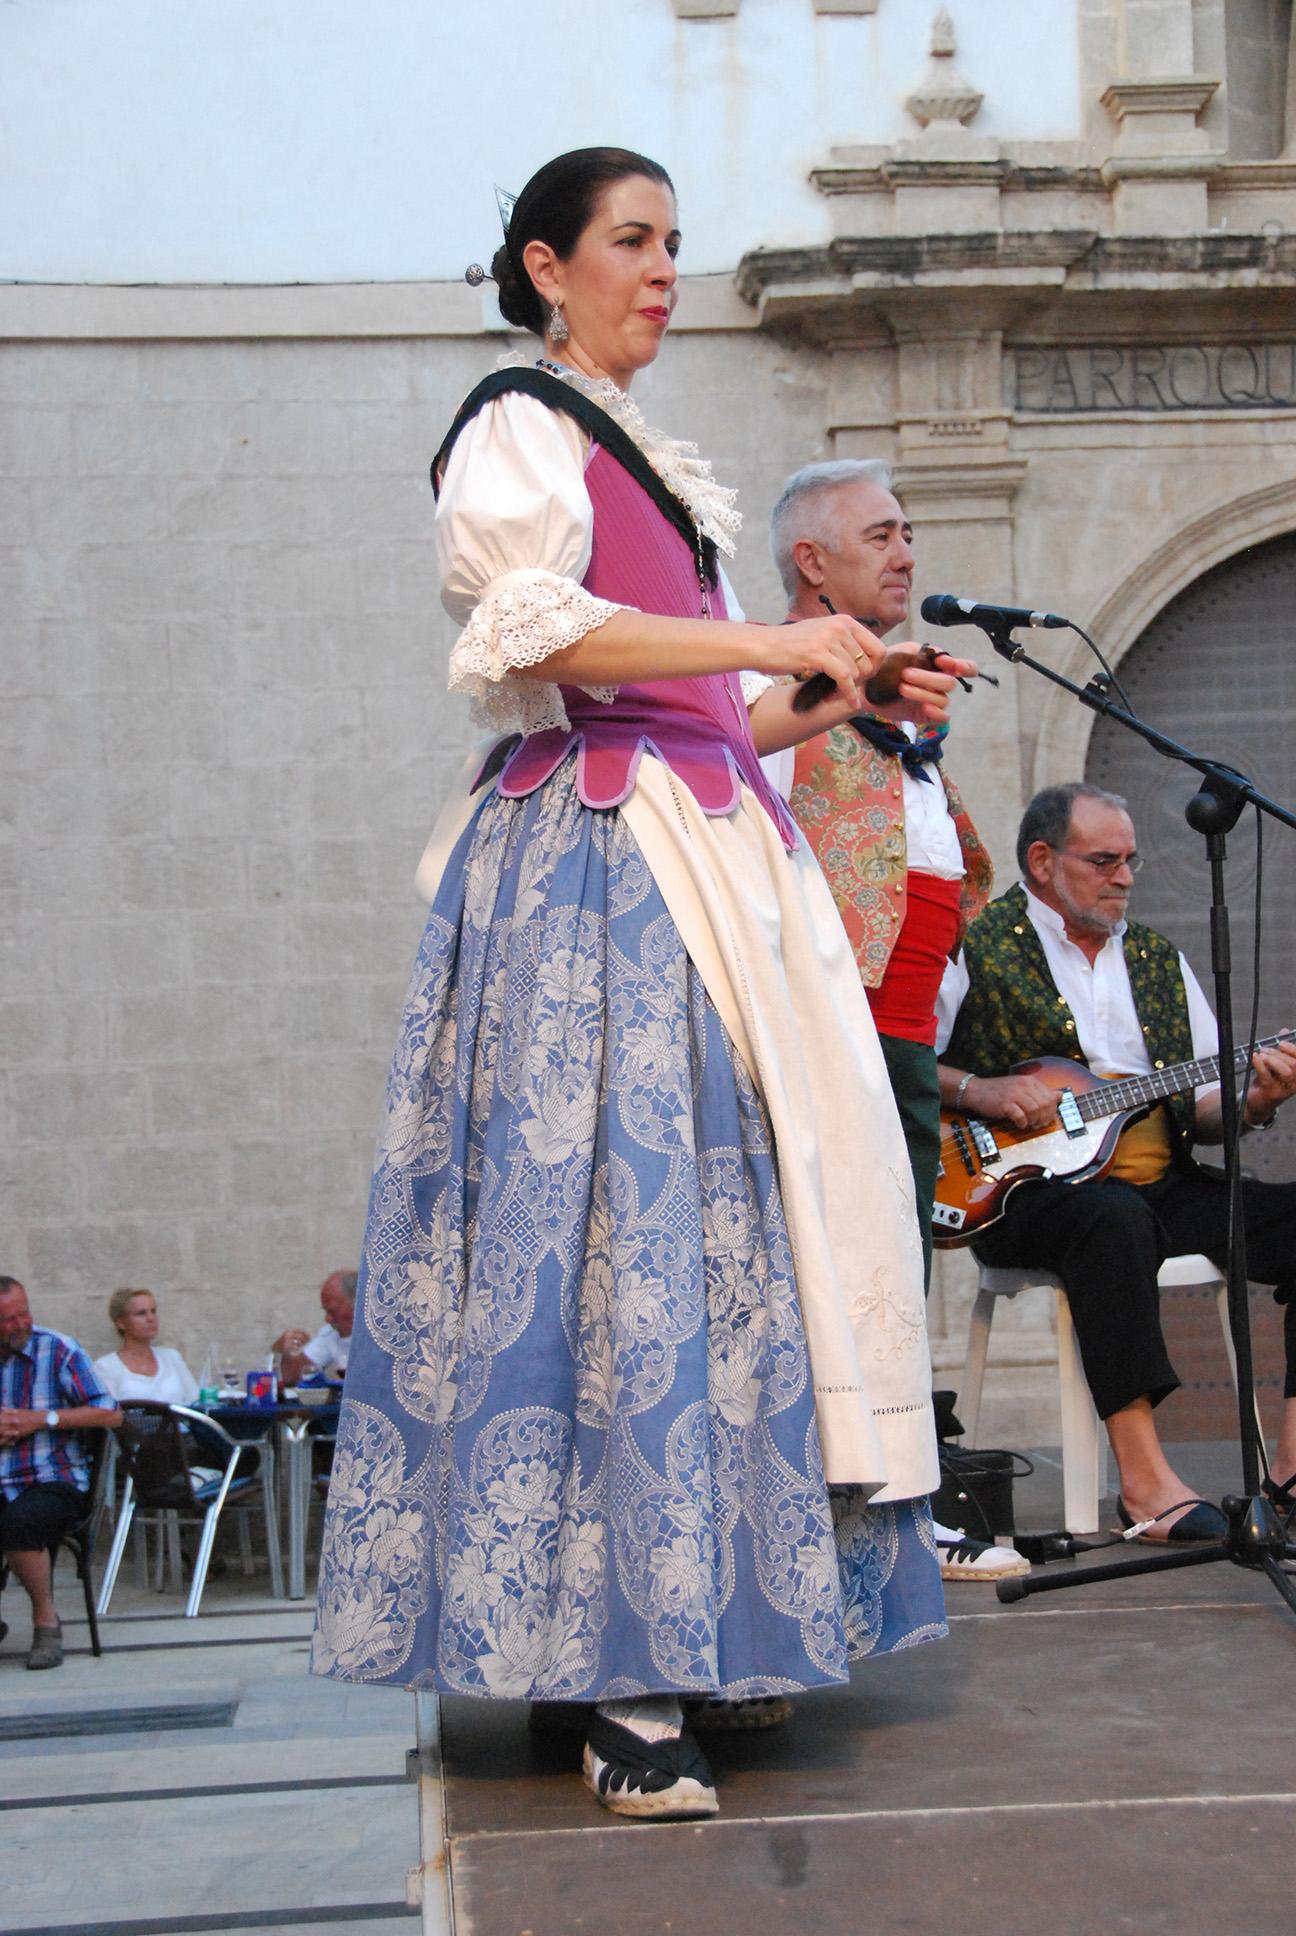 Baladre-FestaMajorDenia 07-07-2013 (103)